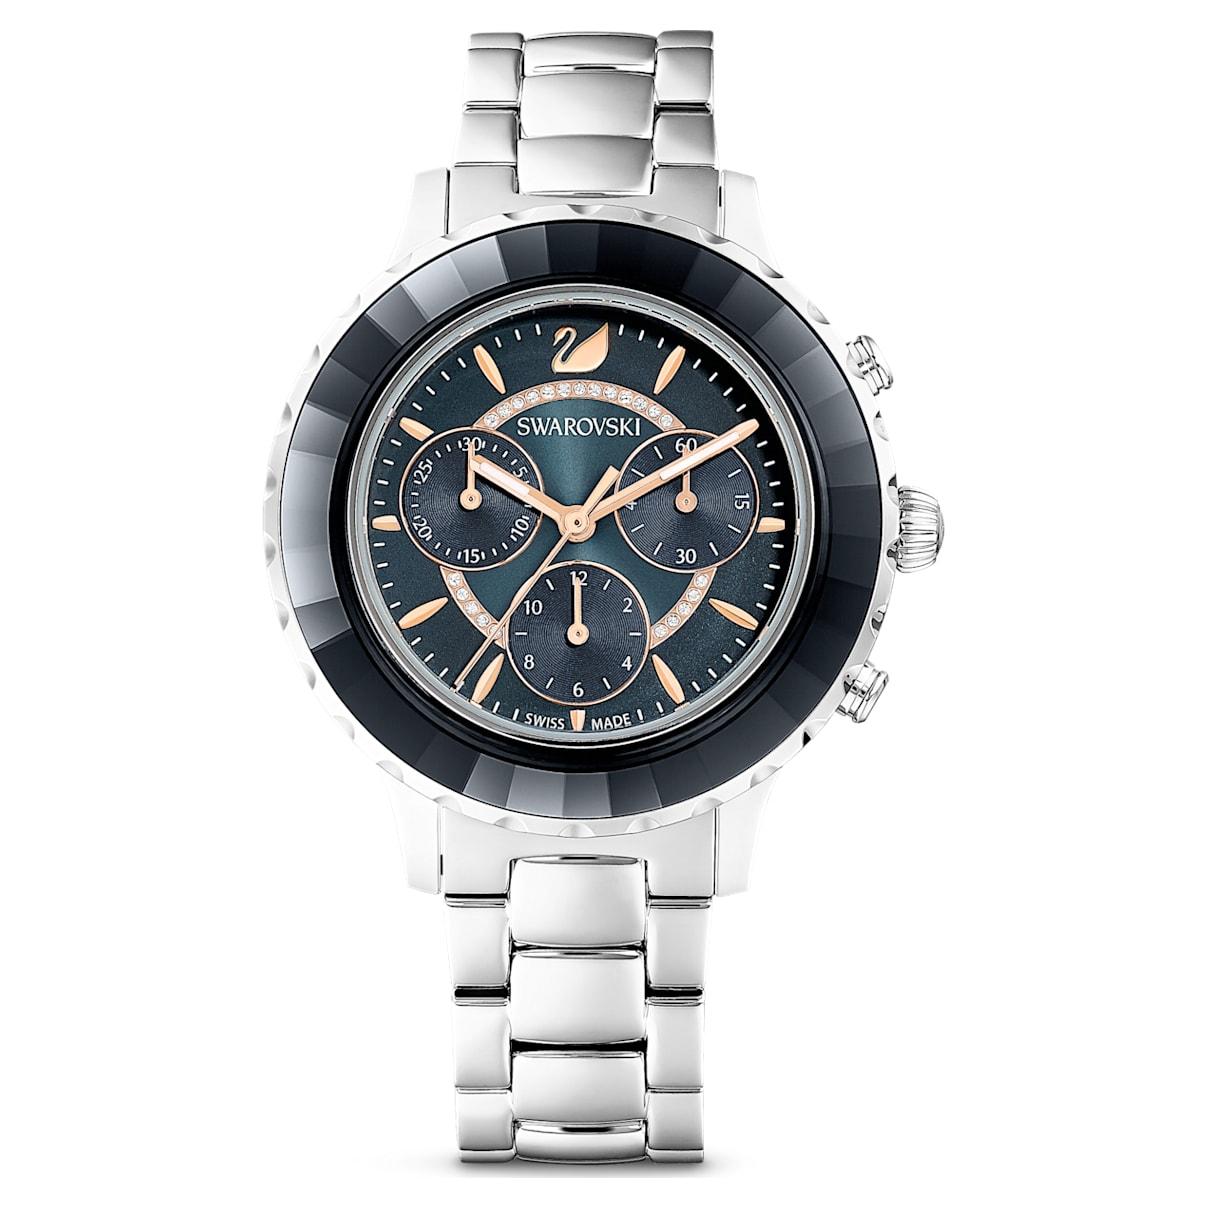 Octea Lux Chrono Watch, Metal bracelet, Dark gray, Stainless steel